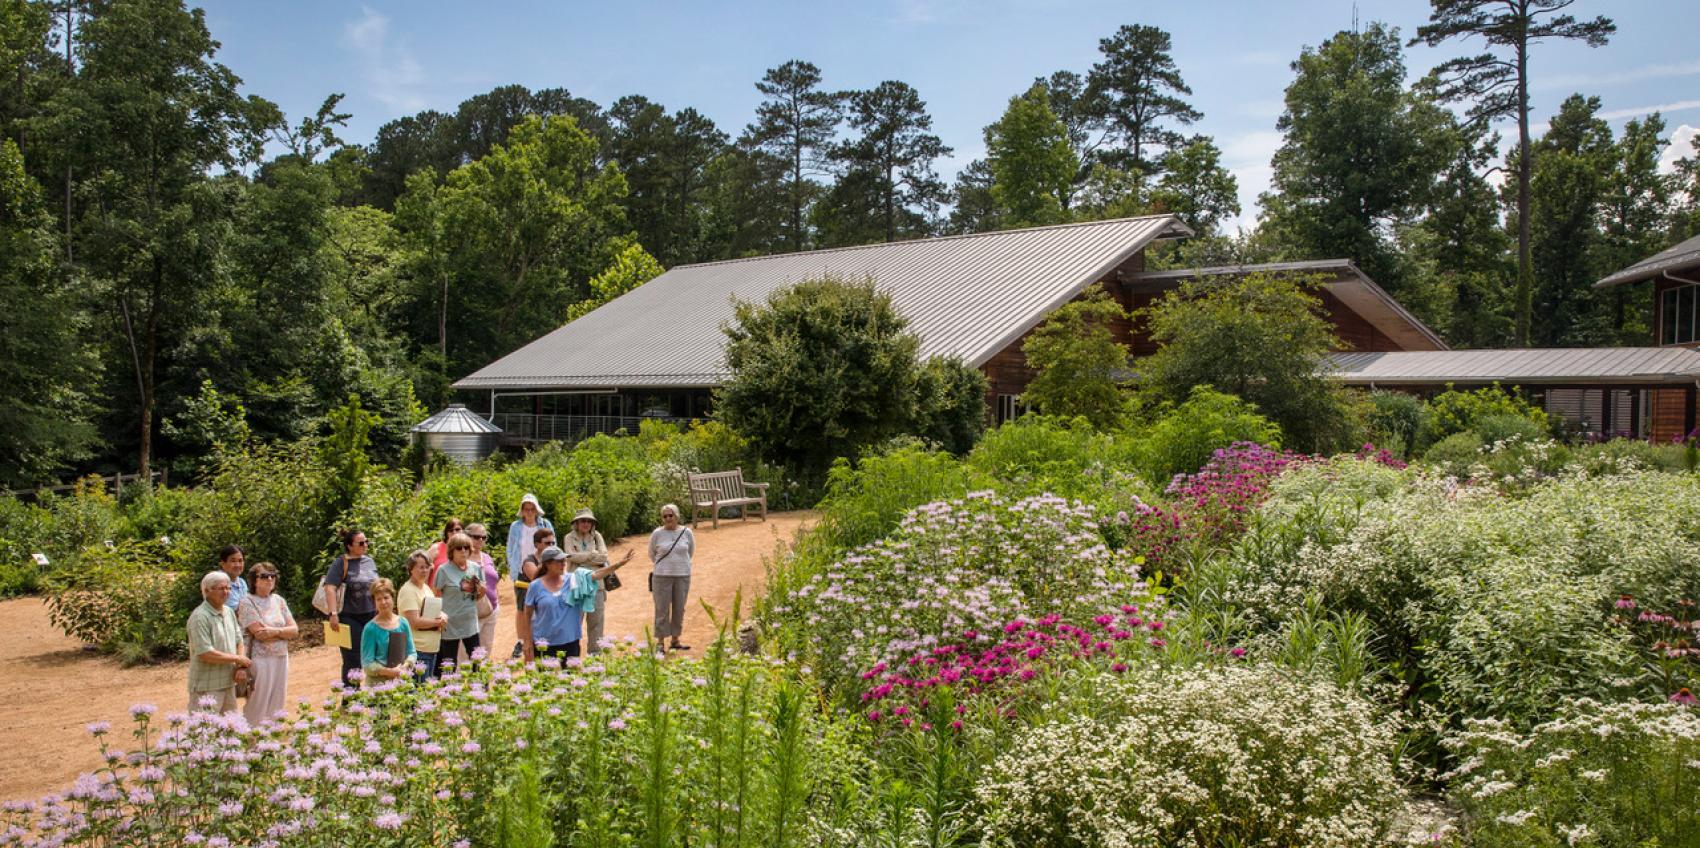 North Carolina Botanical Garden American Public Gardens Association